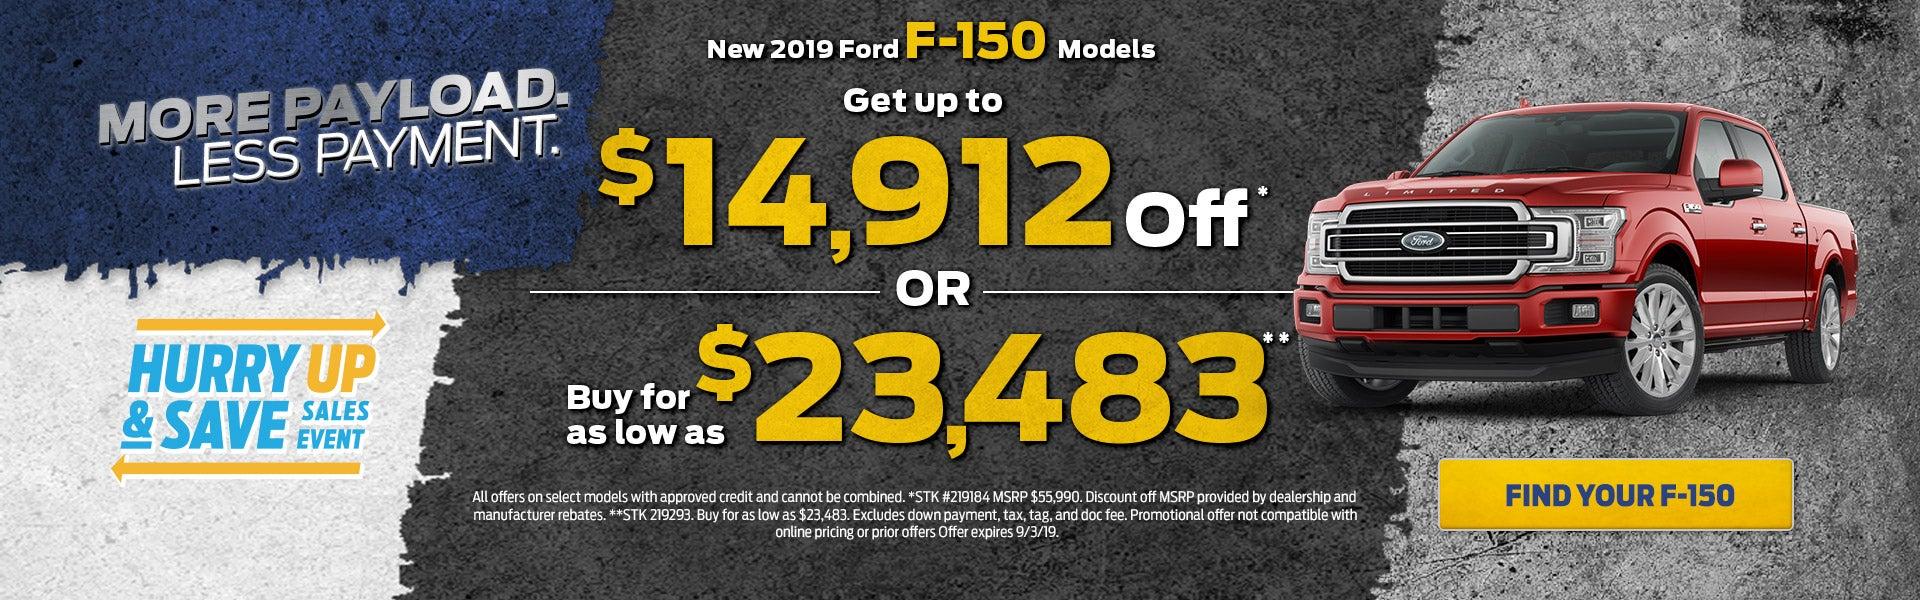 Ford Dealer in Huntersville, NC | Used Cars Huntersville